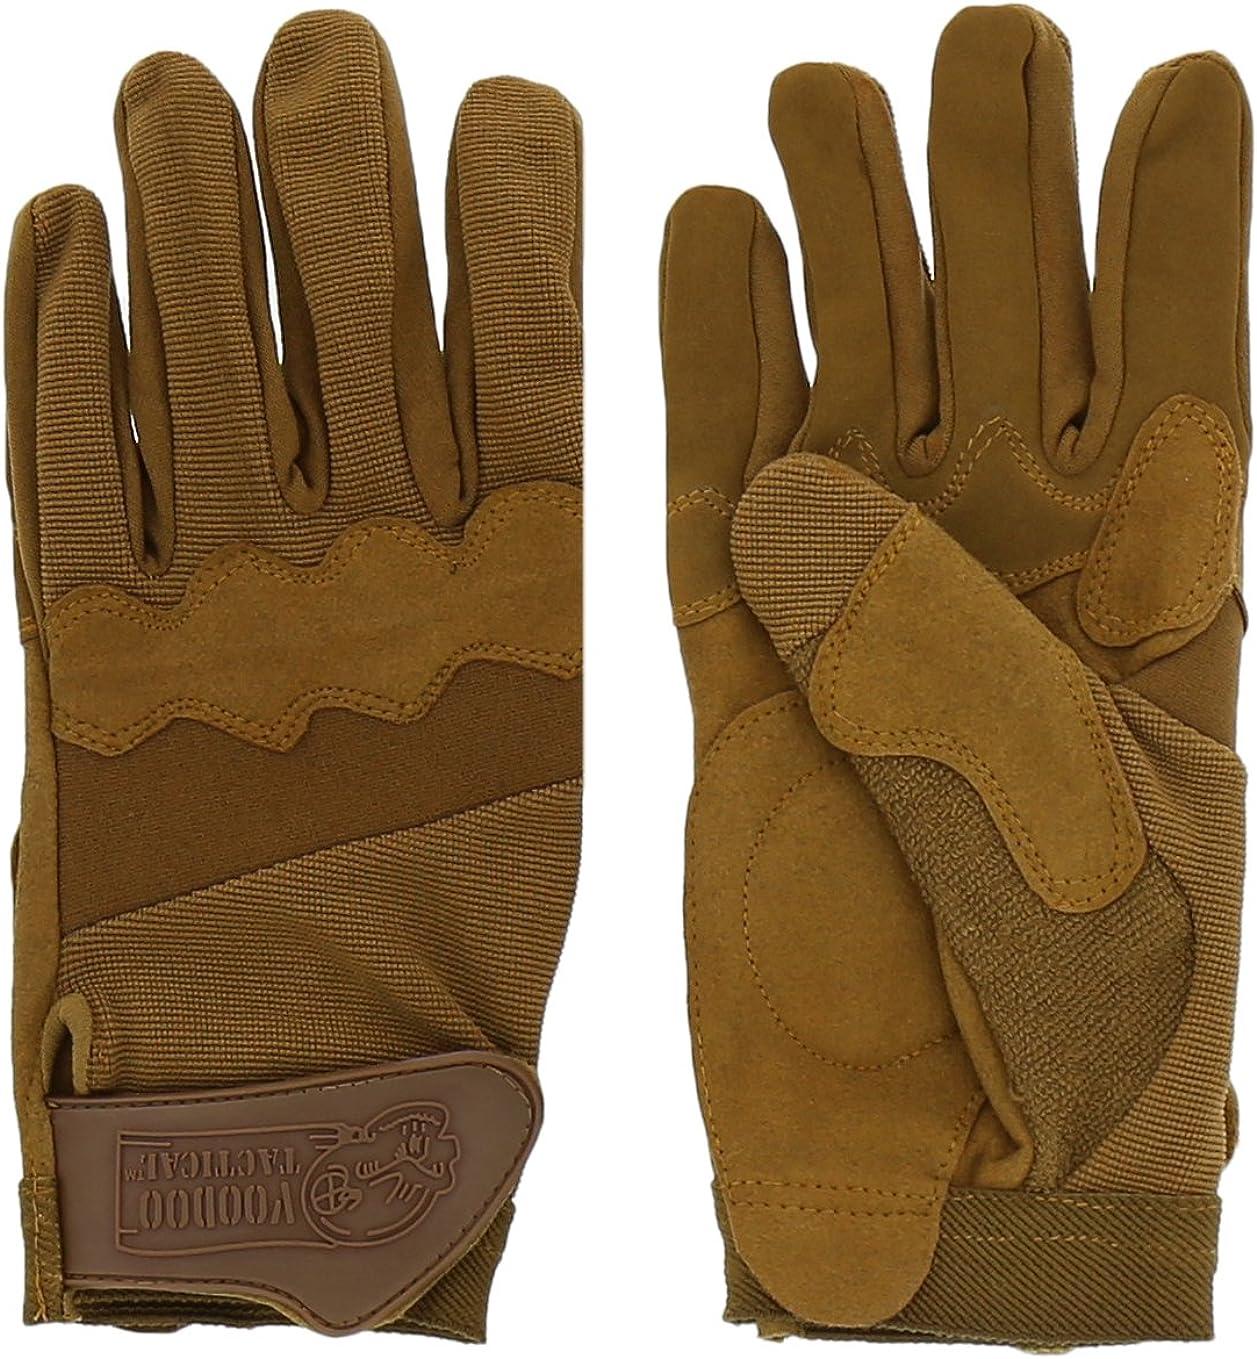 Voodoo Tactical Phantom Gloves 20-9078 (Knuckle Protectors)